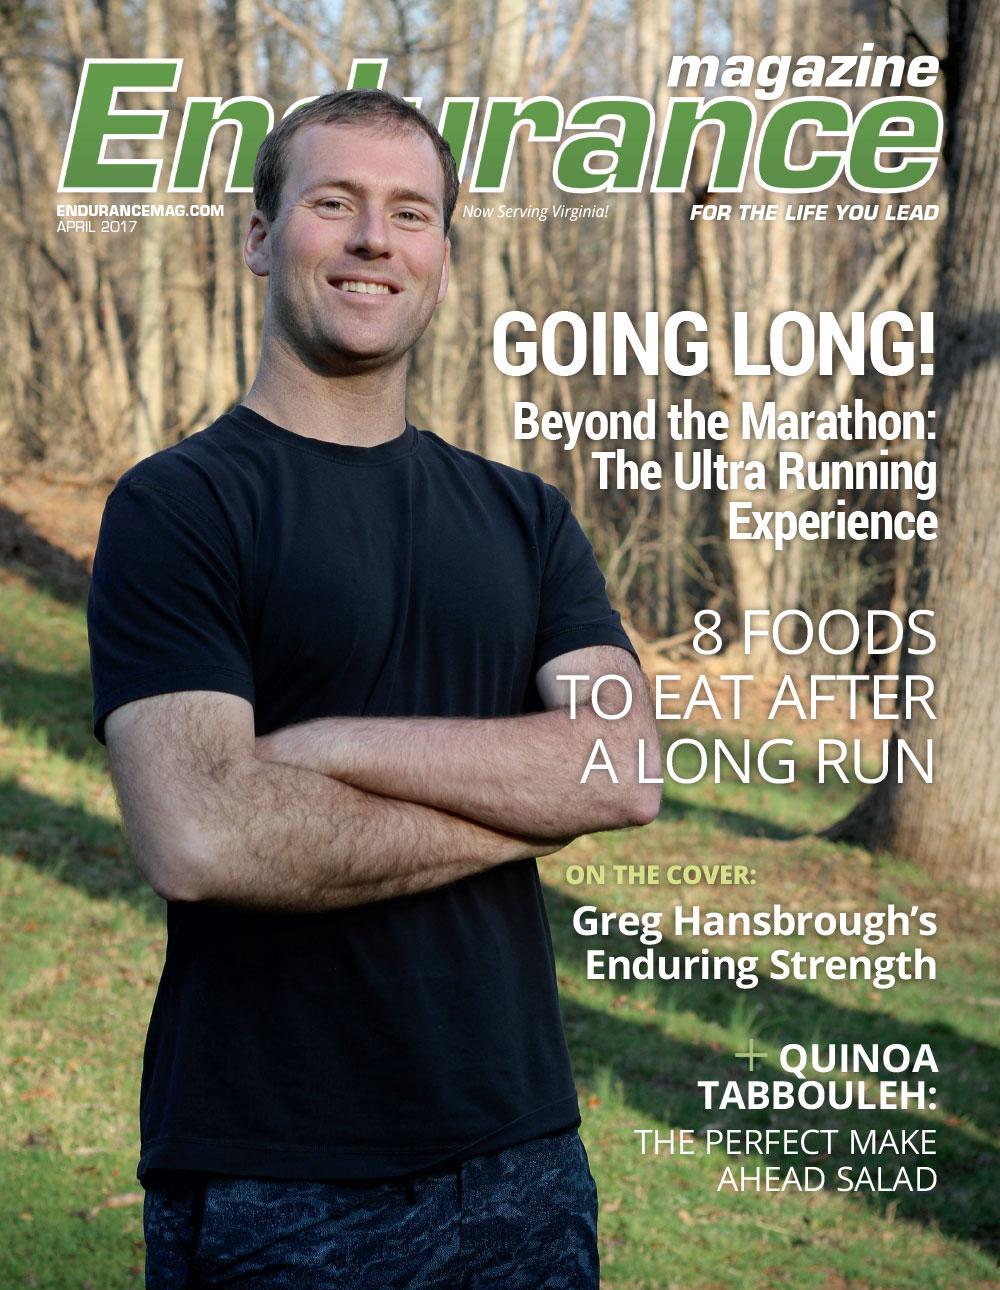 Endurance Triangle apr 2017 Cover